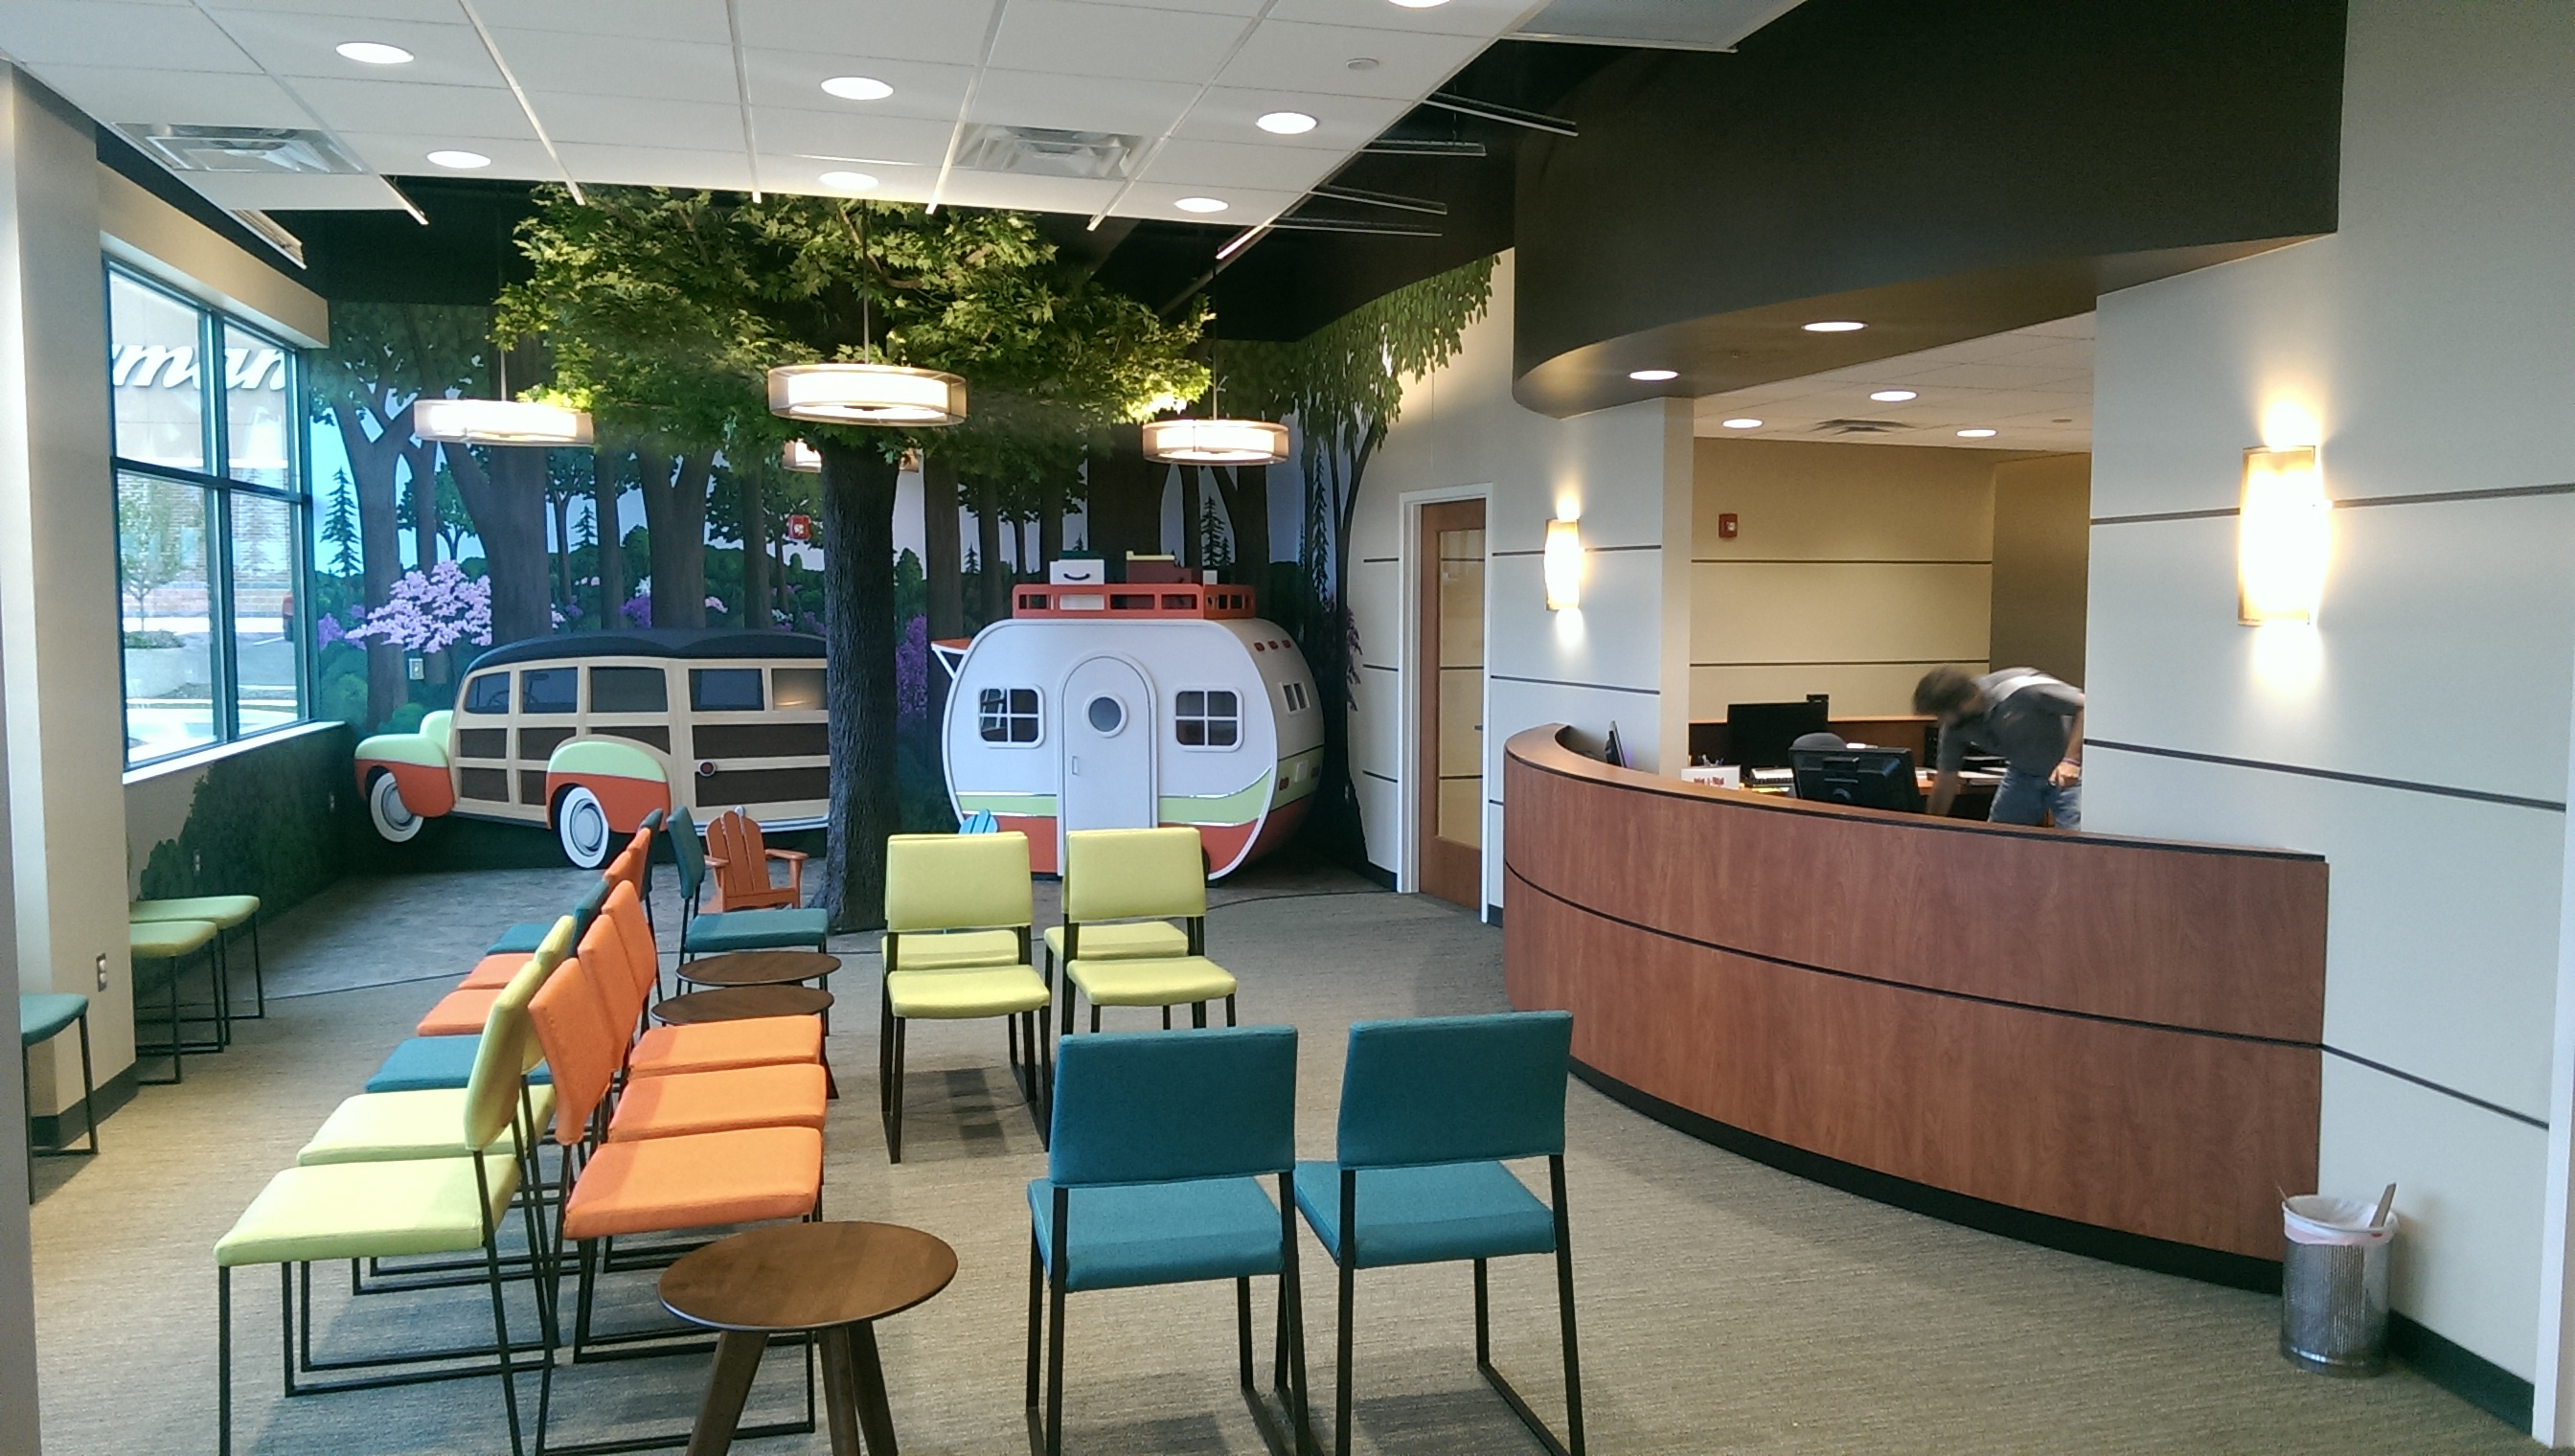 Children's Dental Office - ad image